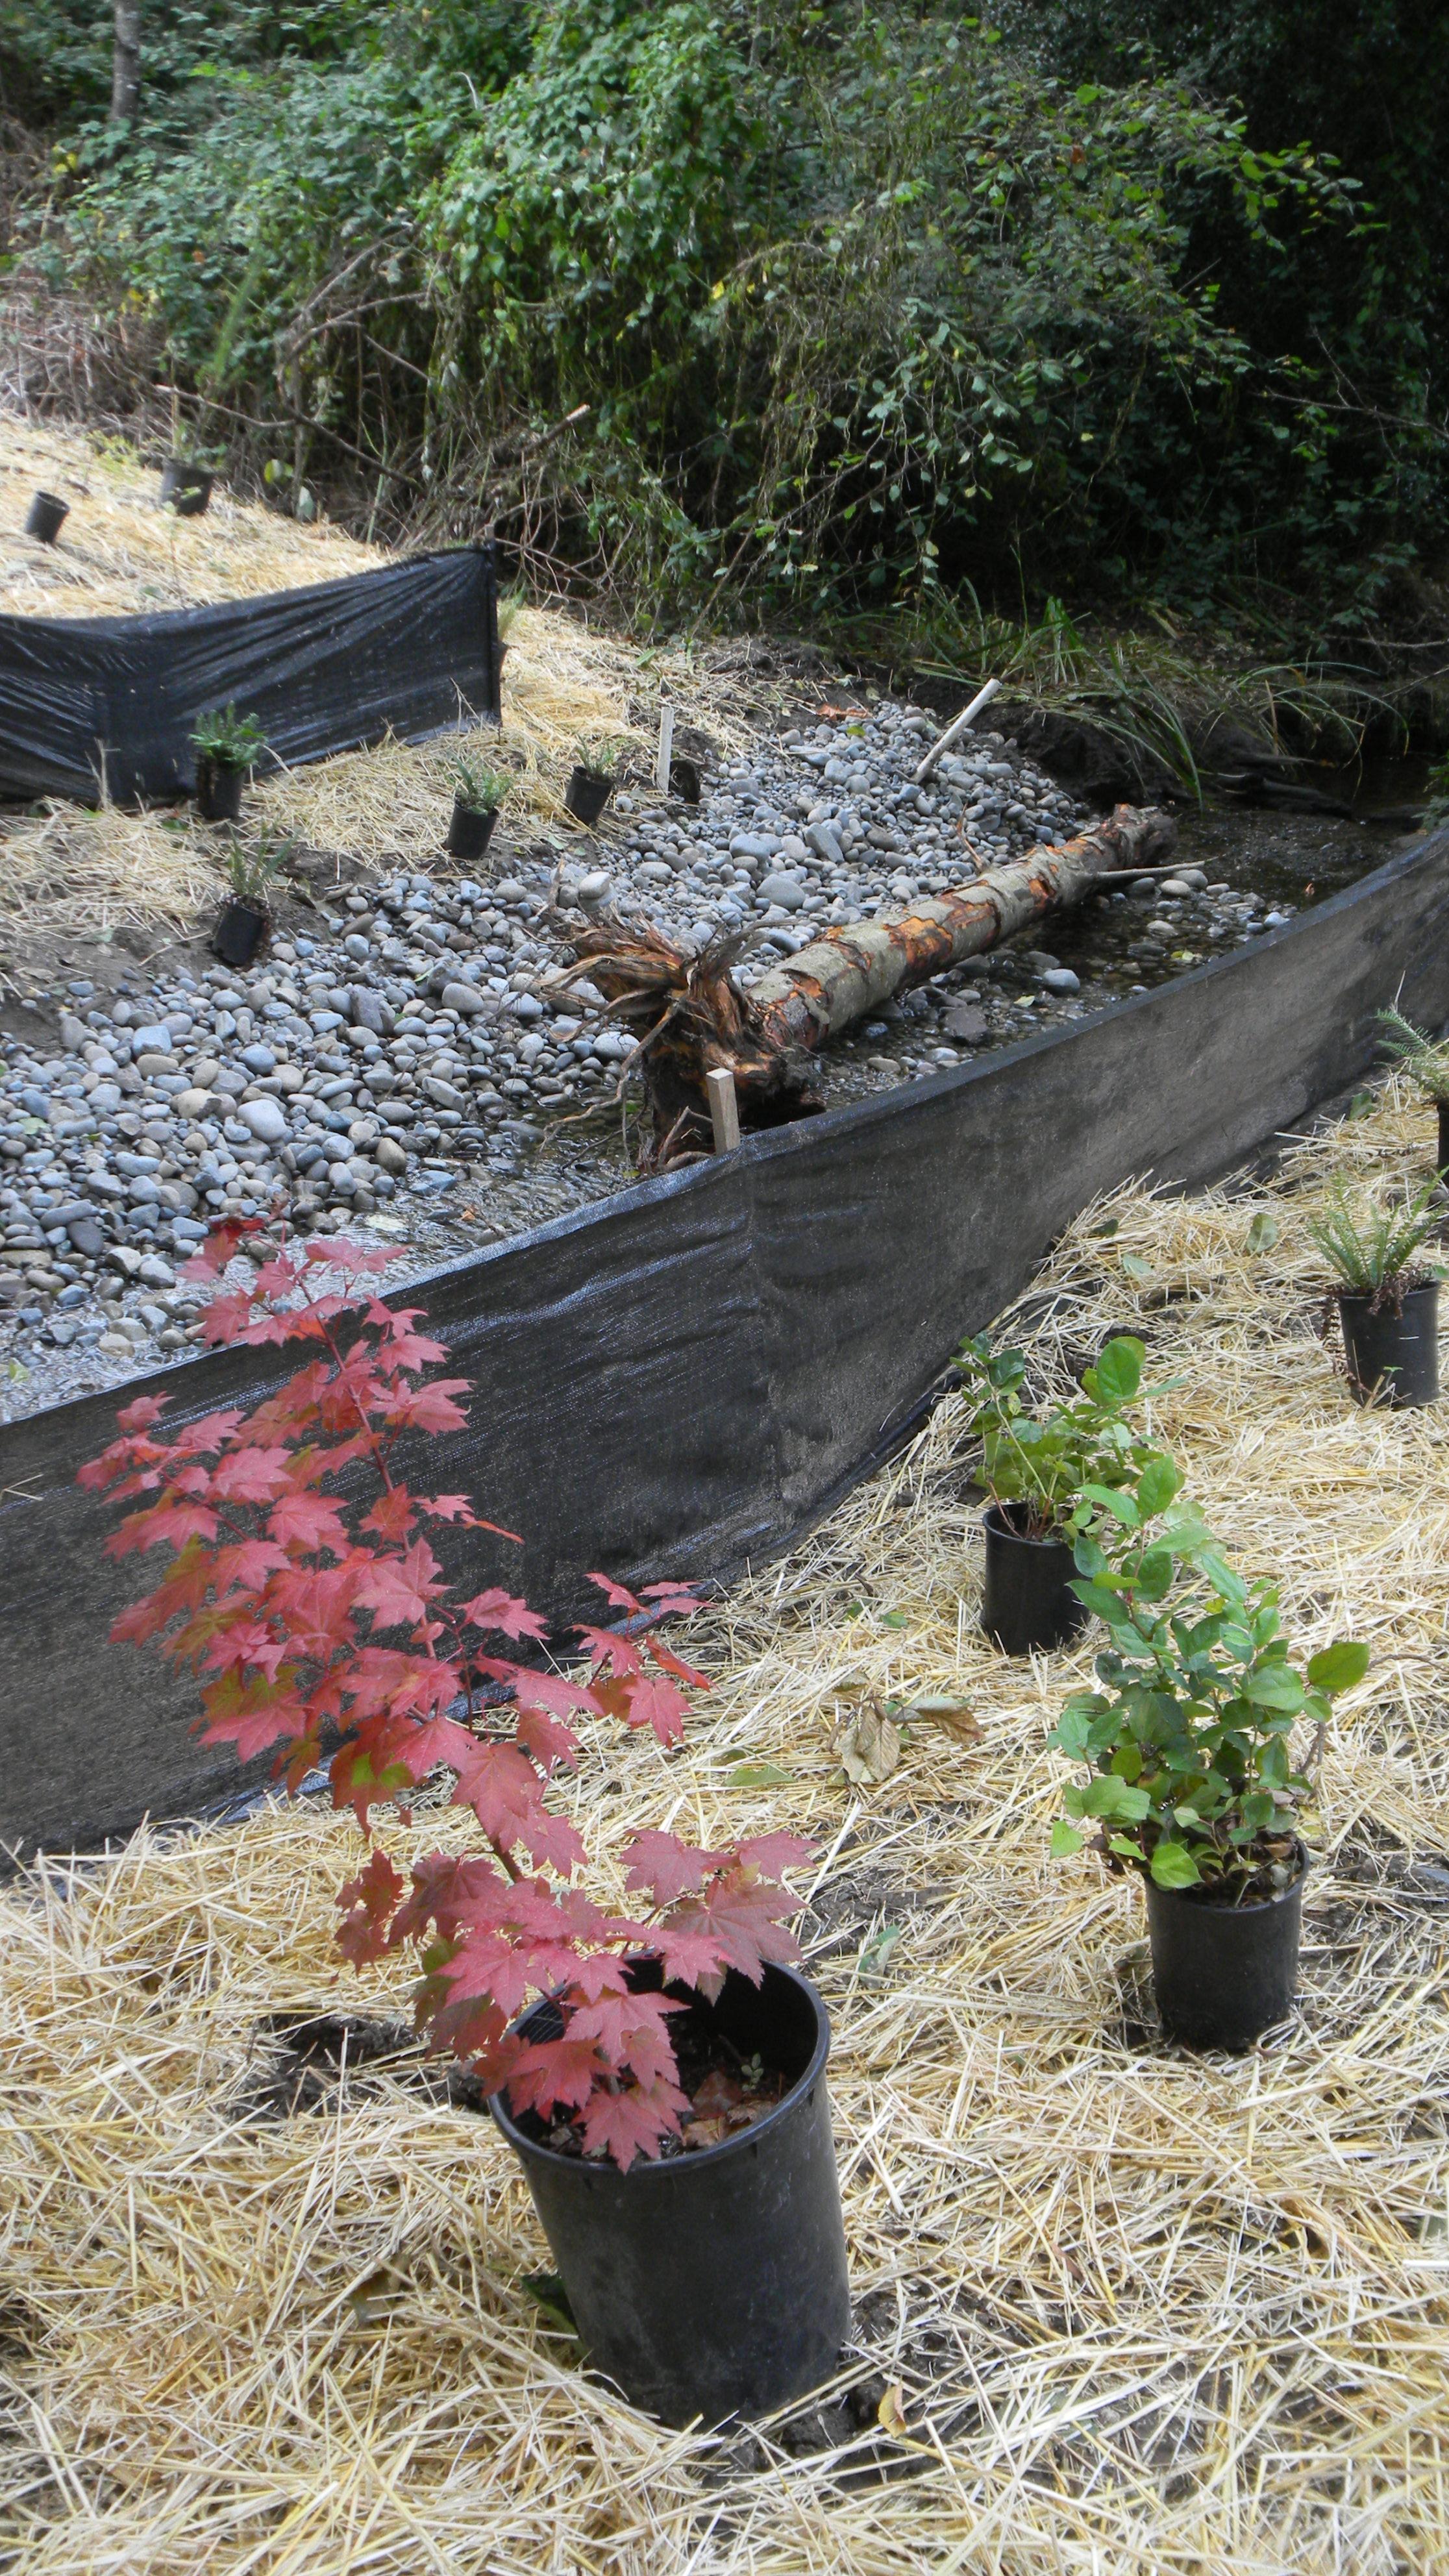 Backyard habitat grant stream planting